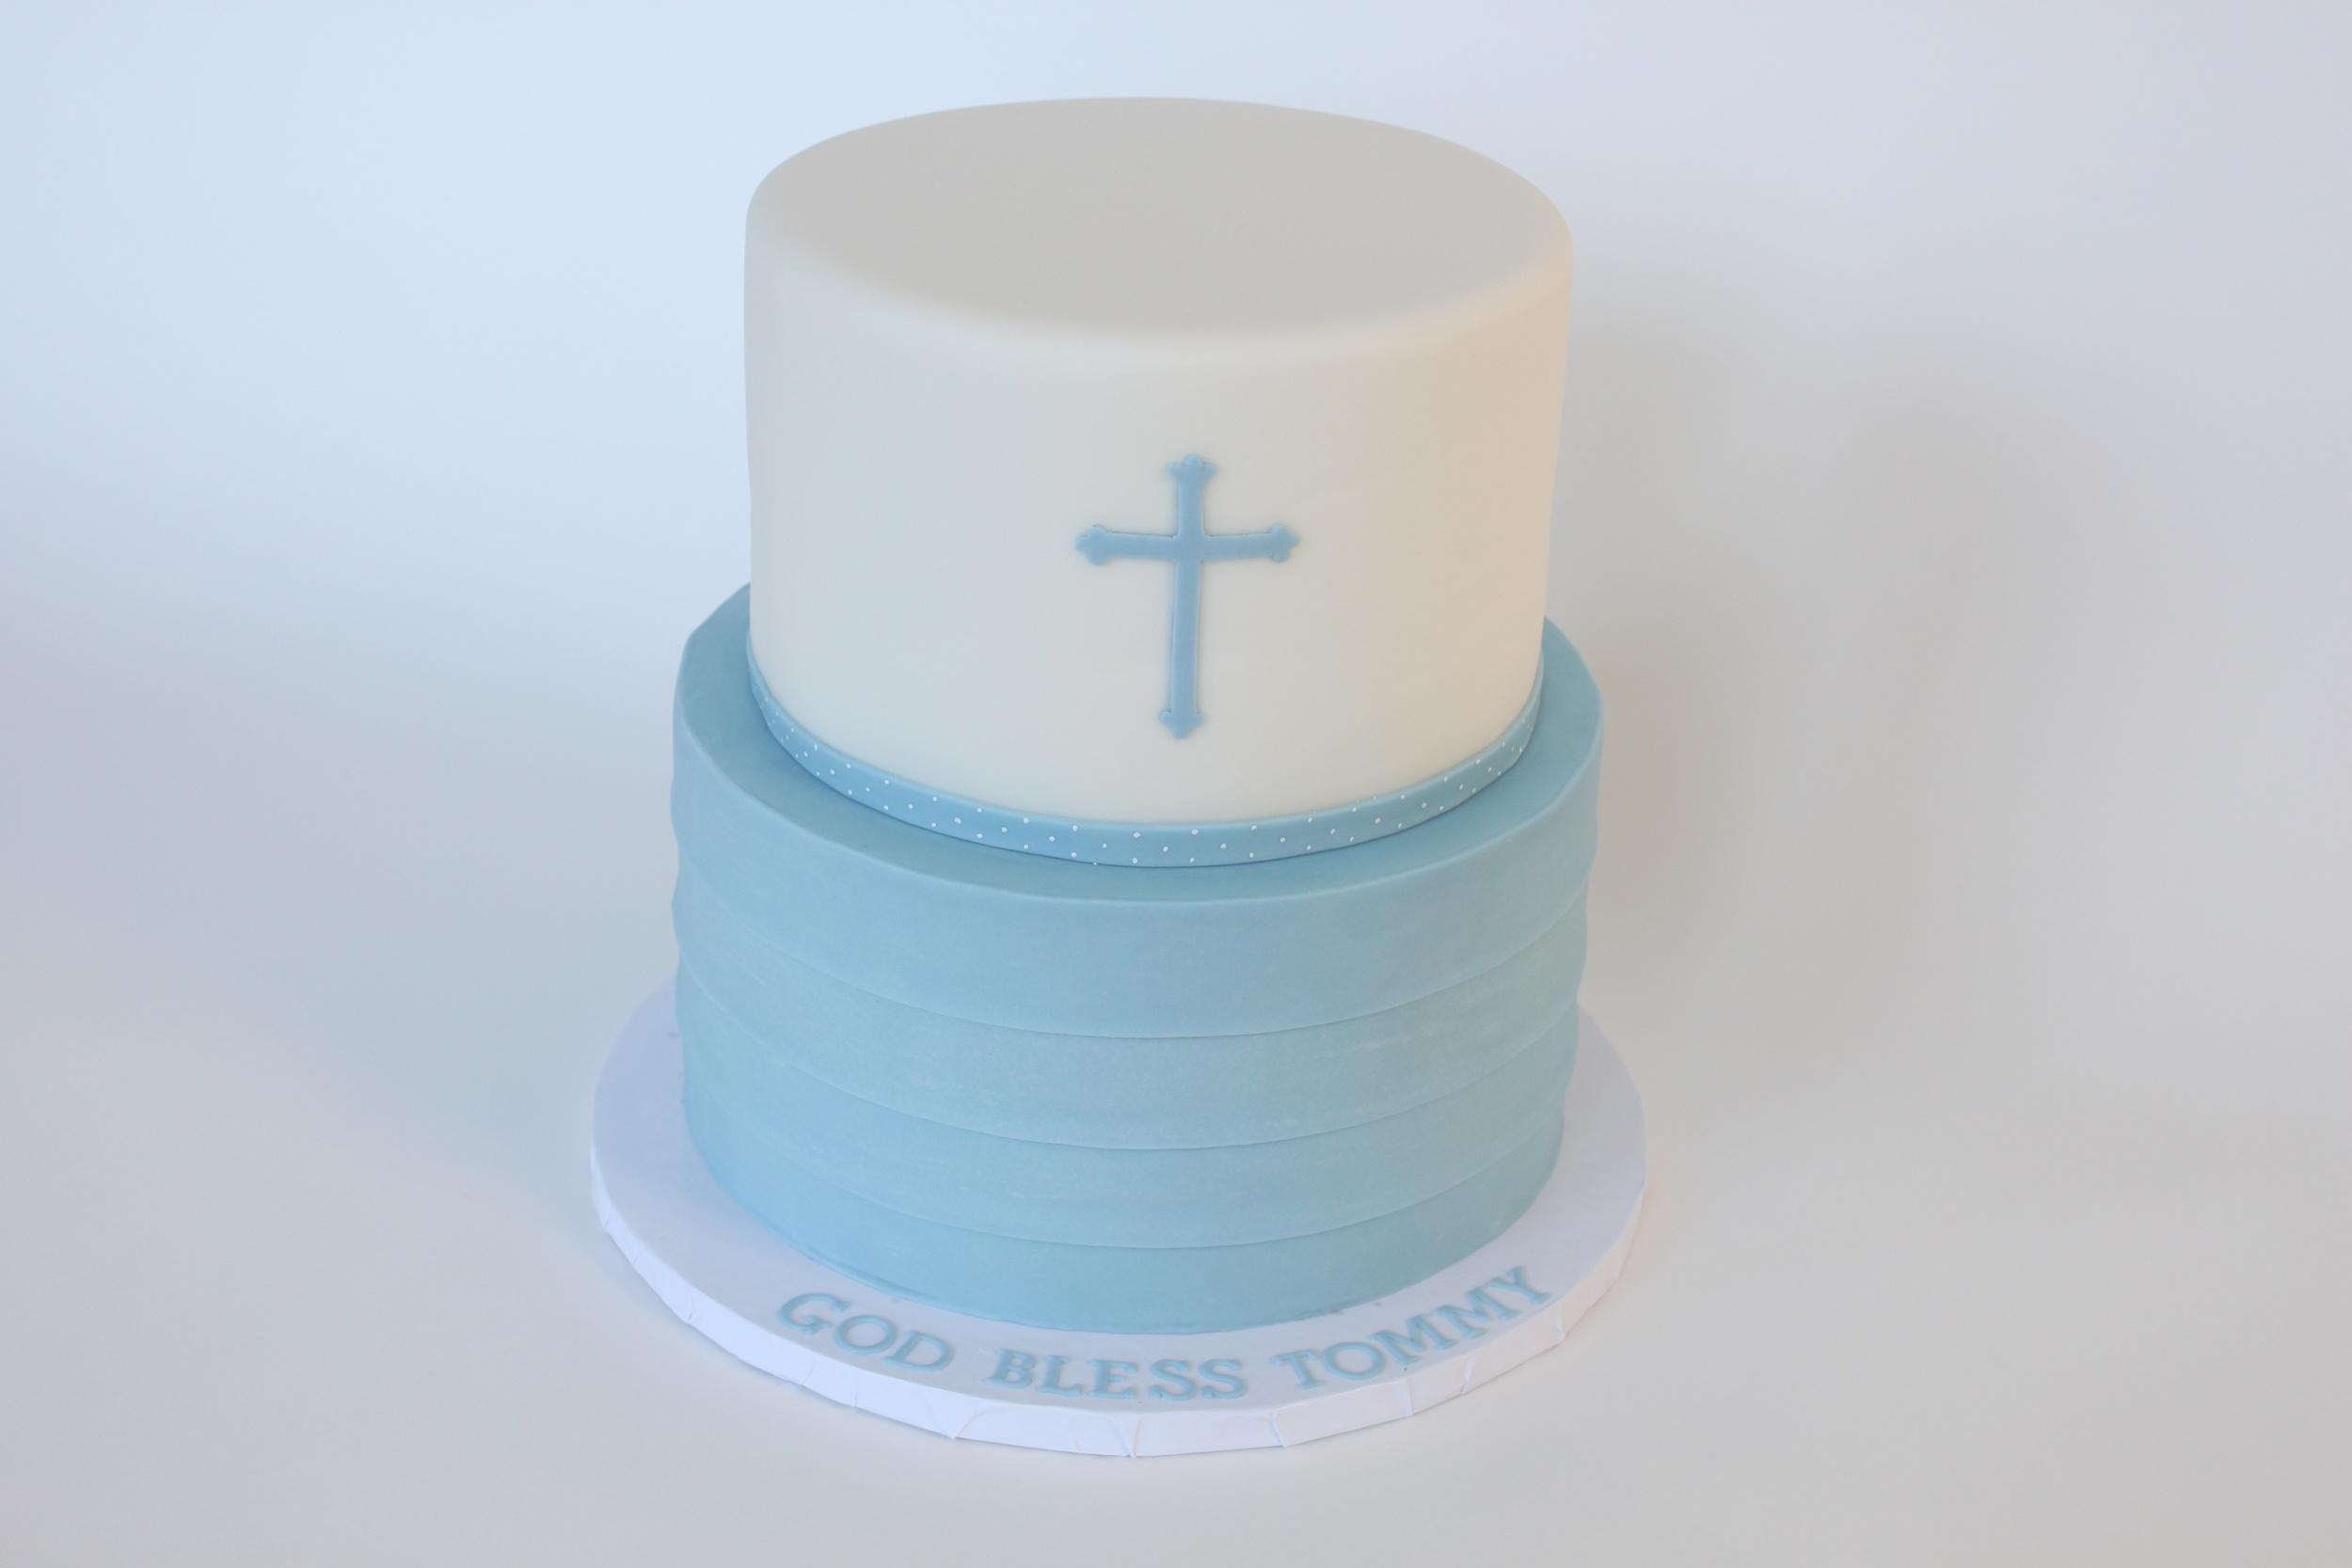 baptism cake horizontal 9942.jpg